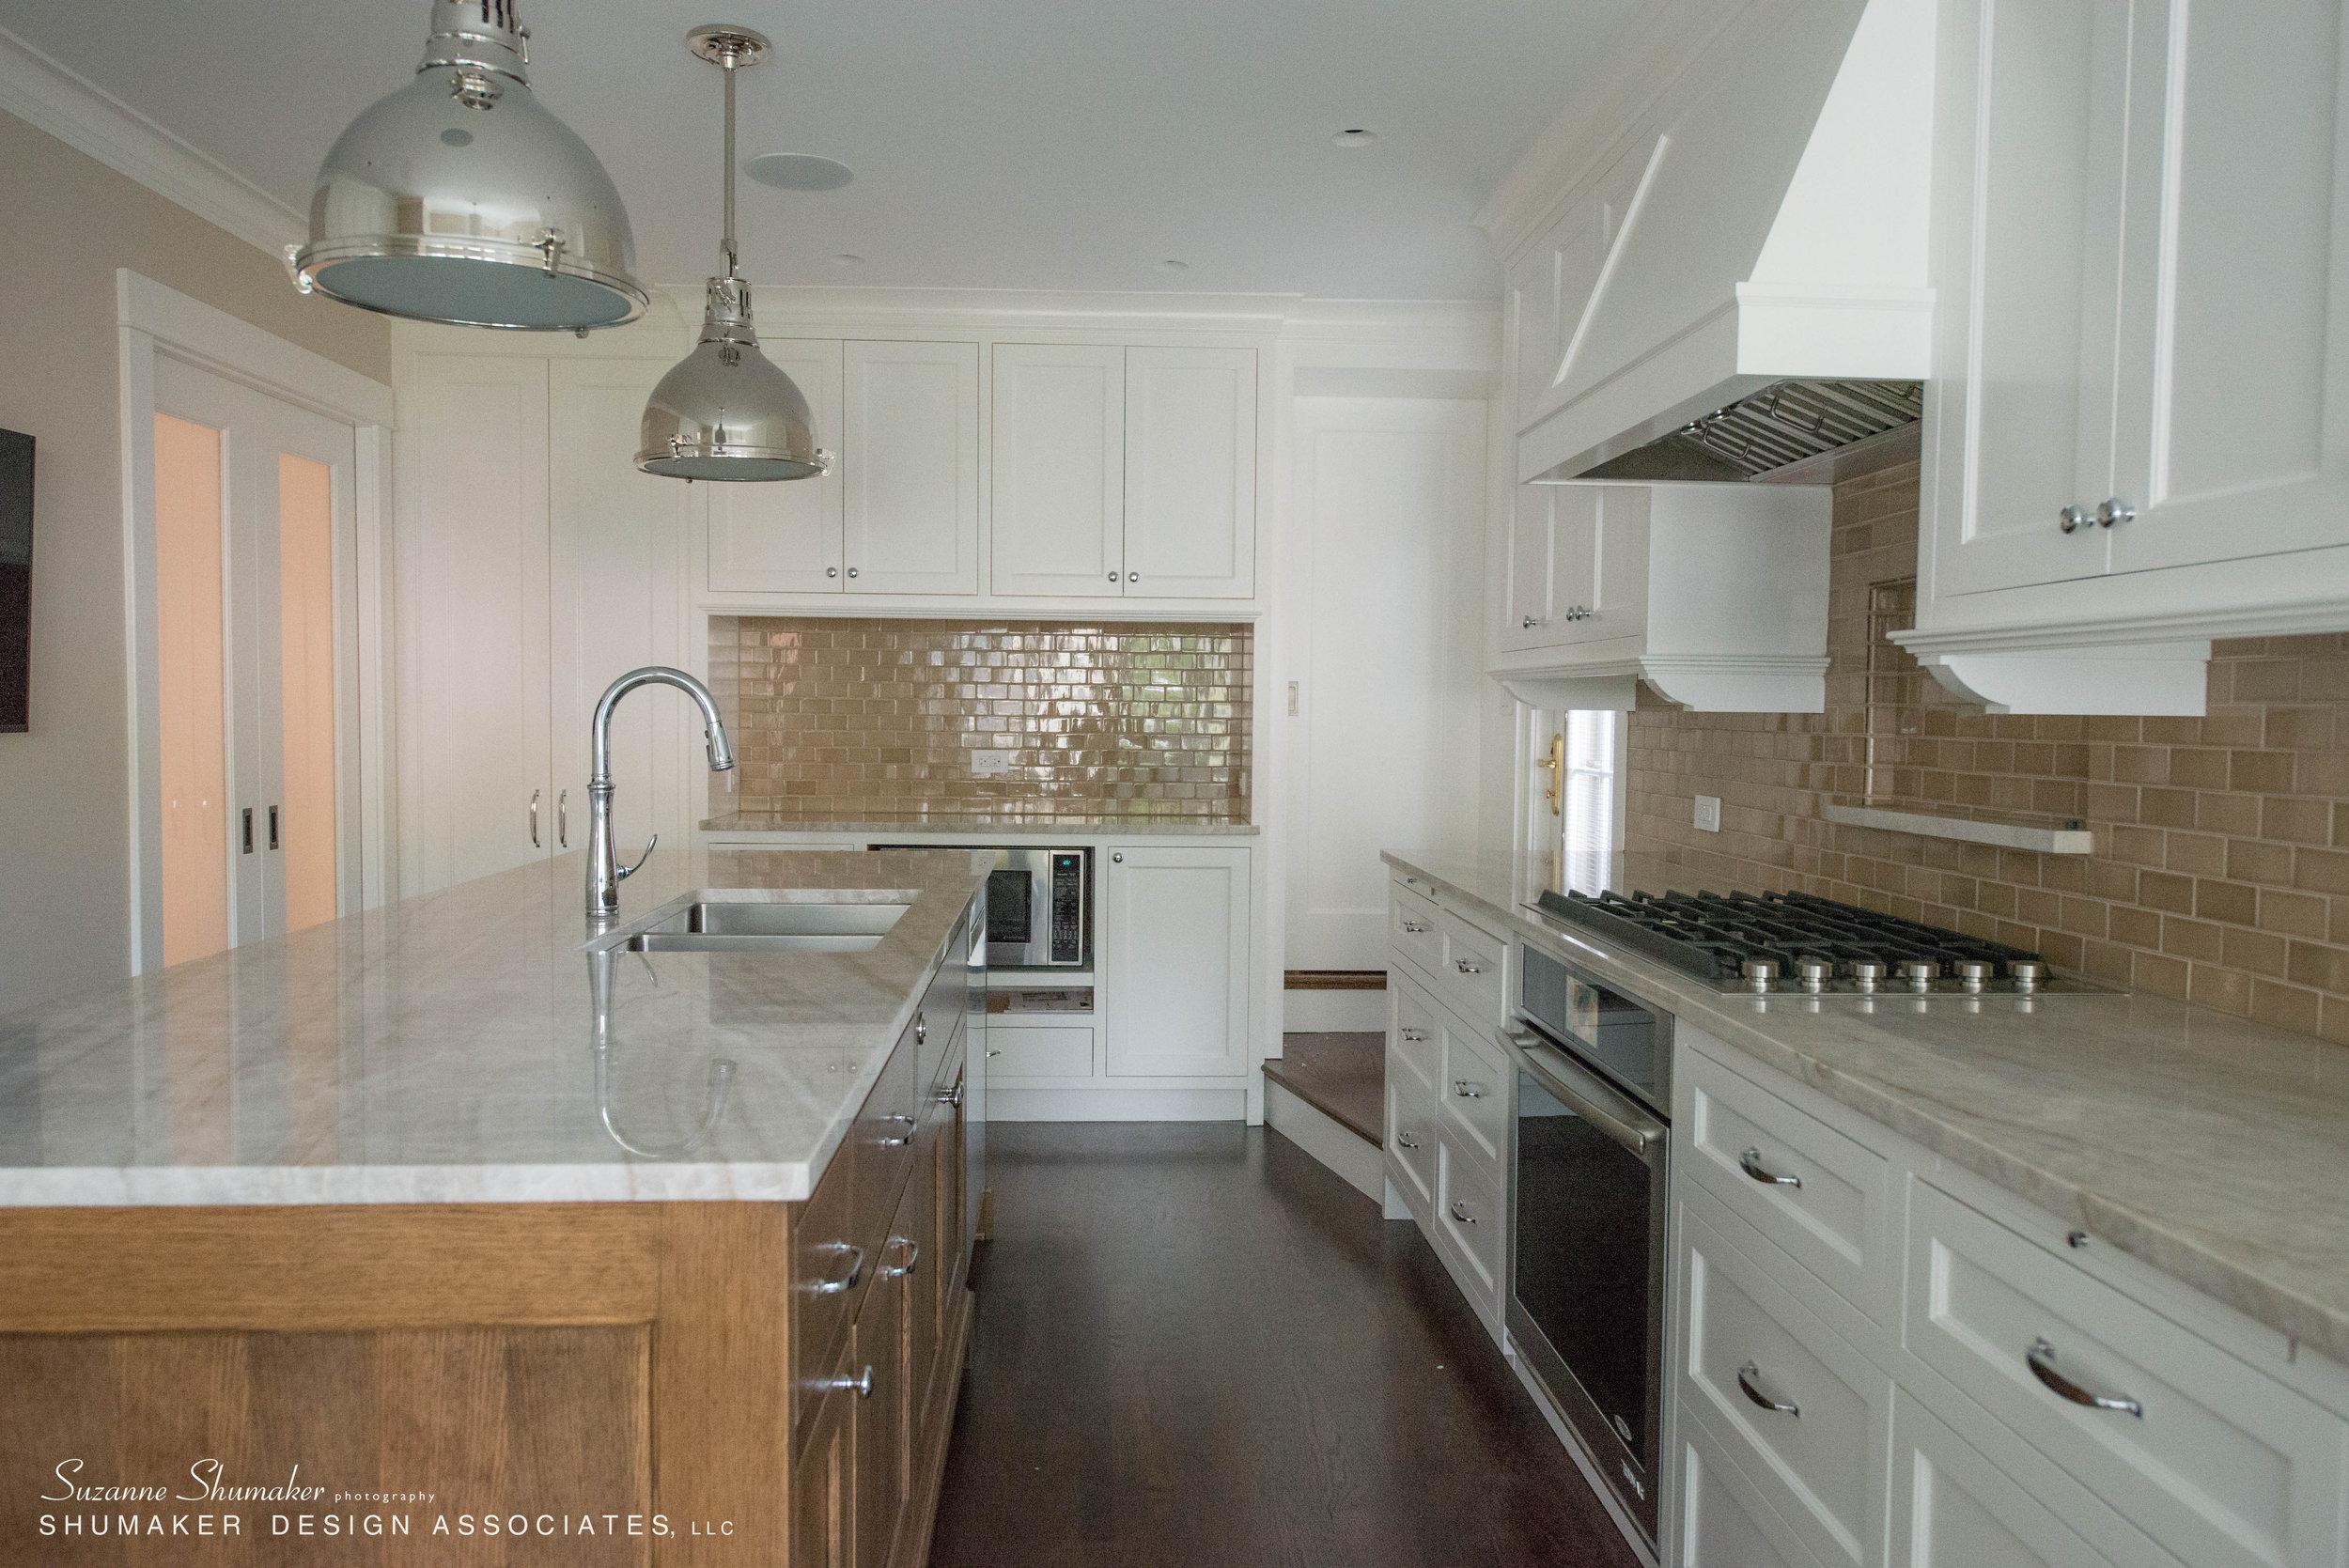 KitchenSSphotography.jpg